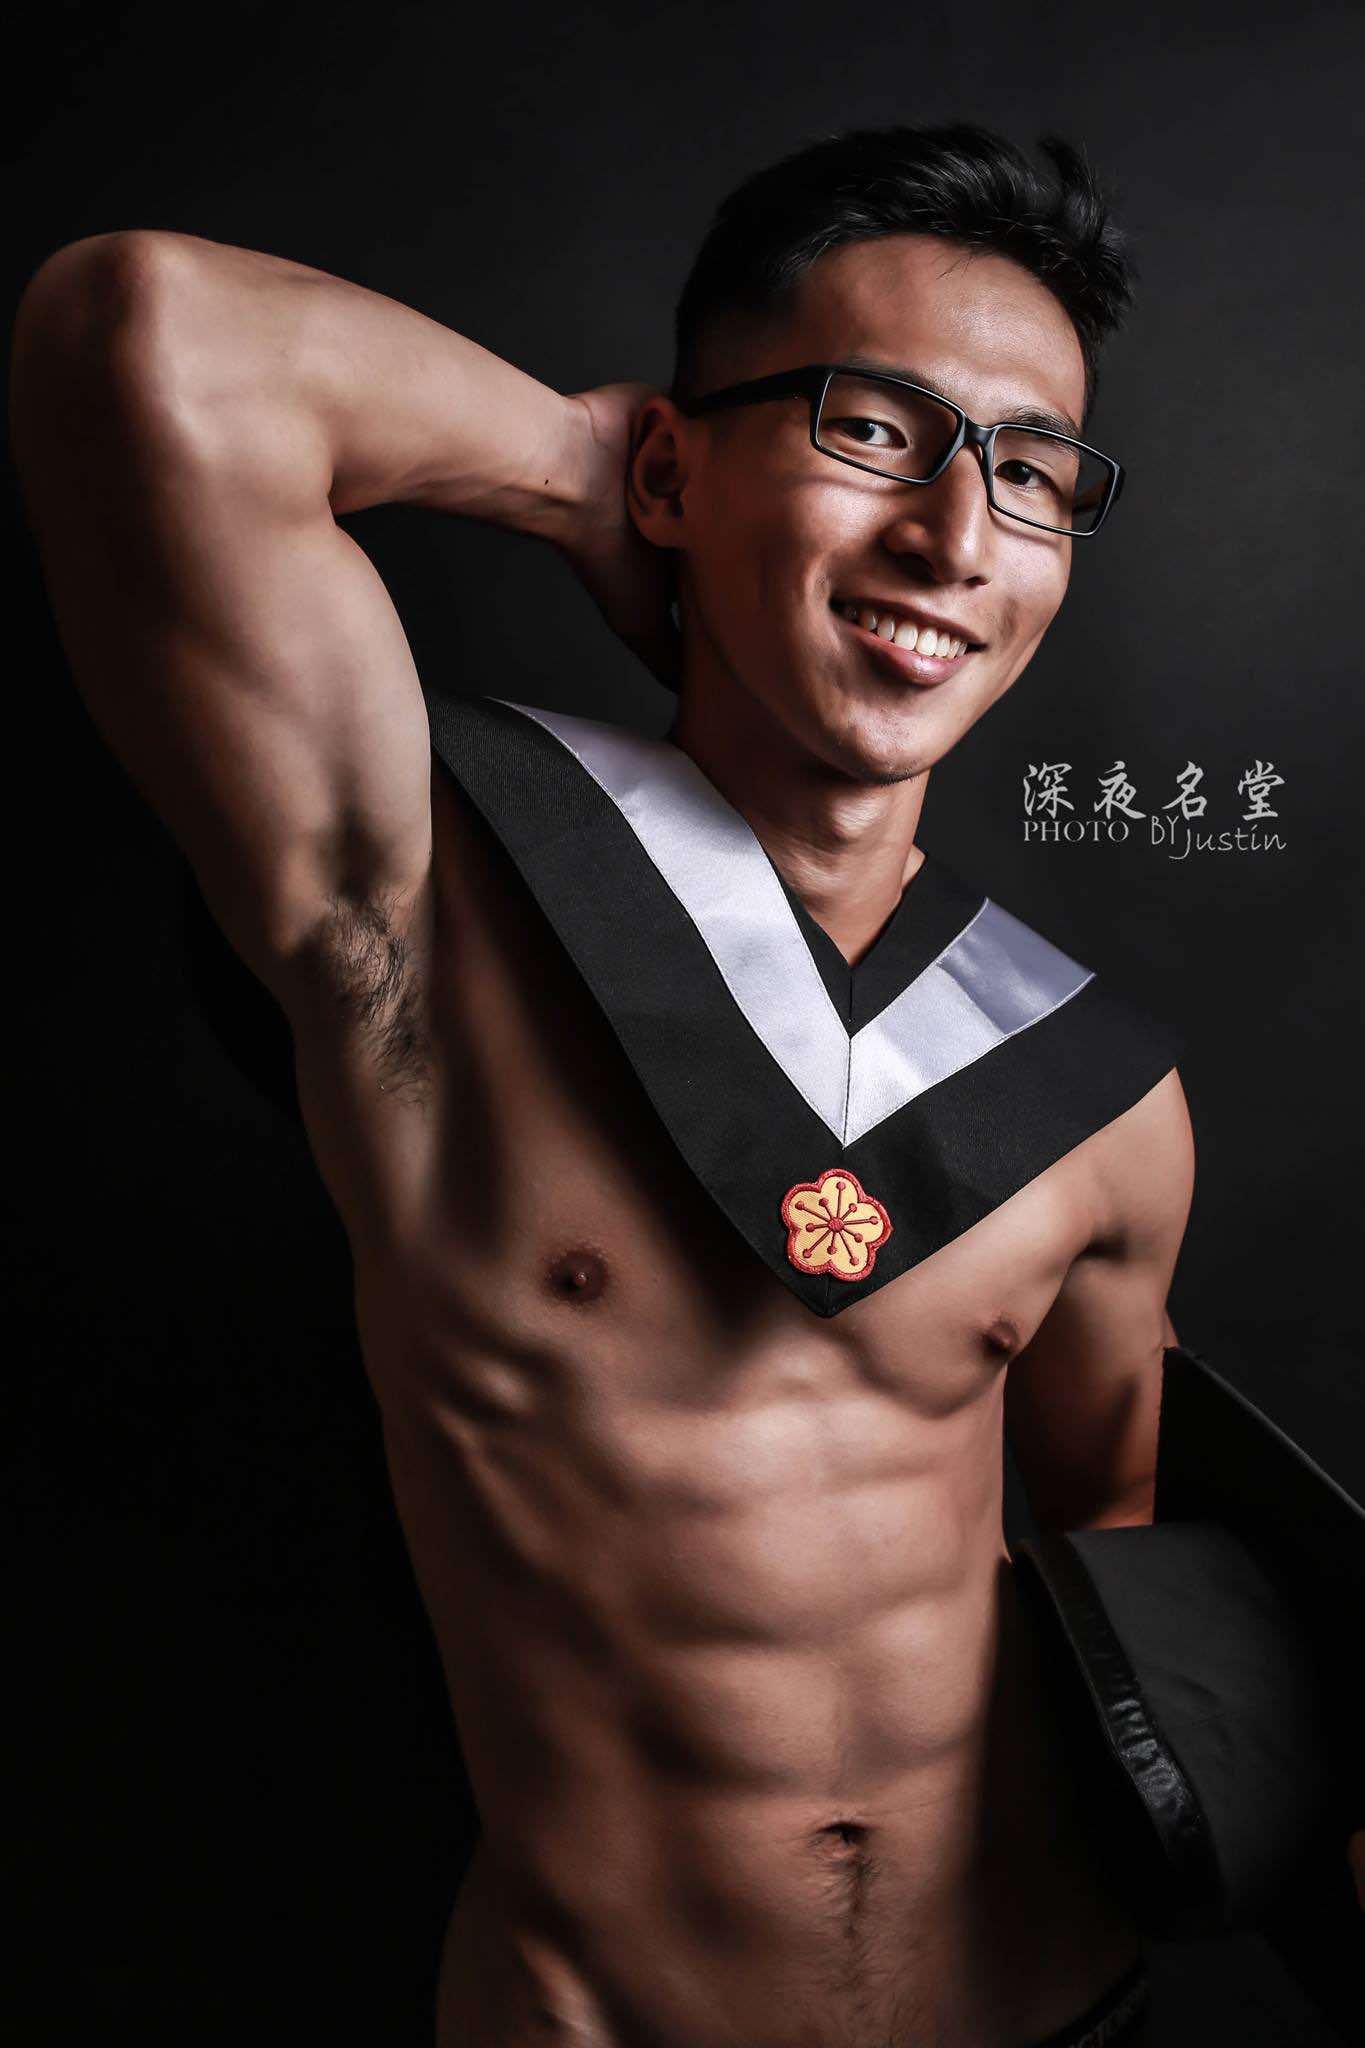 Justin Hsieh Photography Graduate - AspirantSG